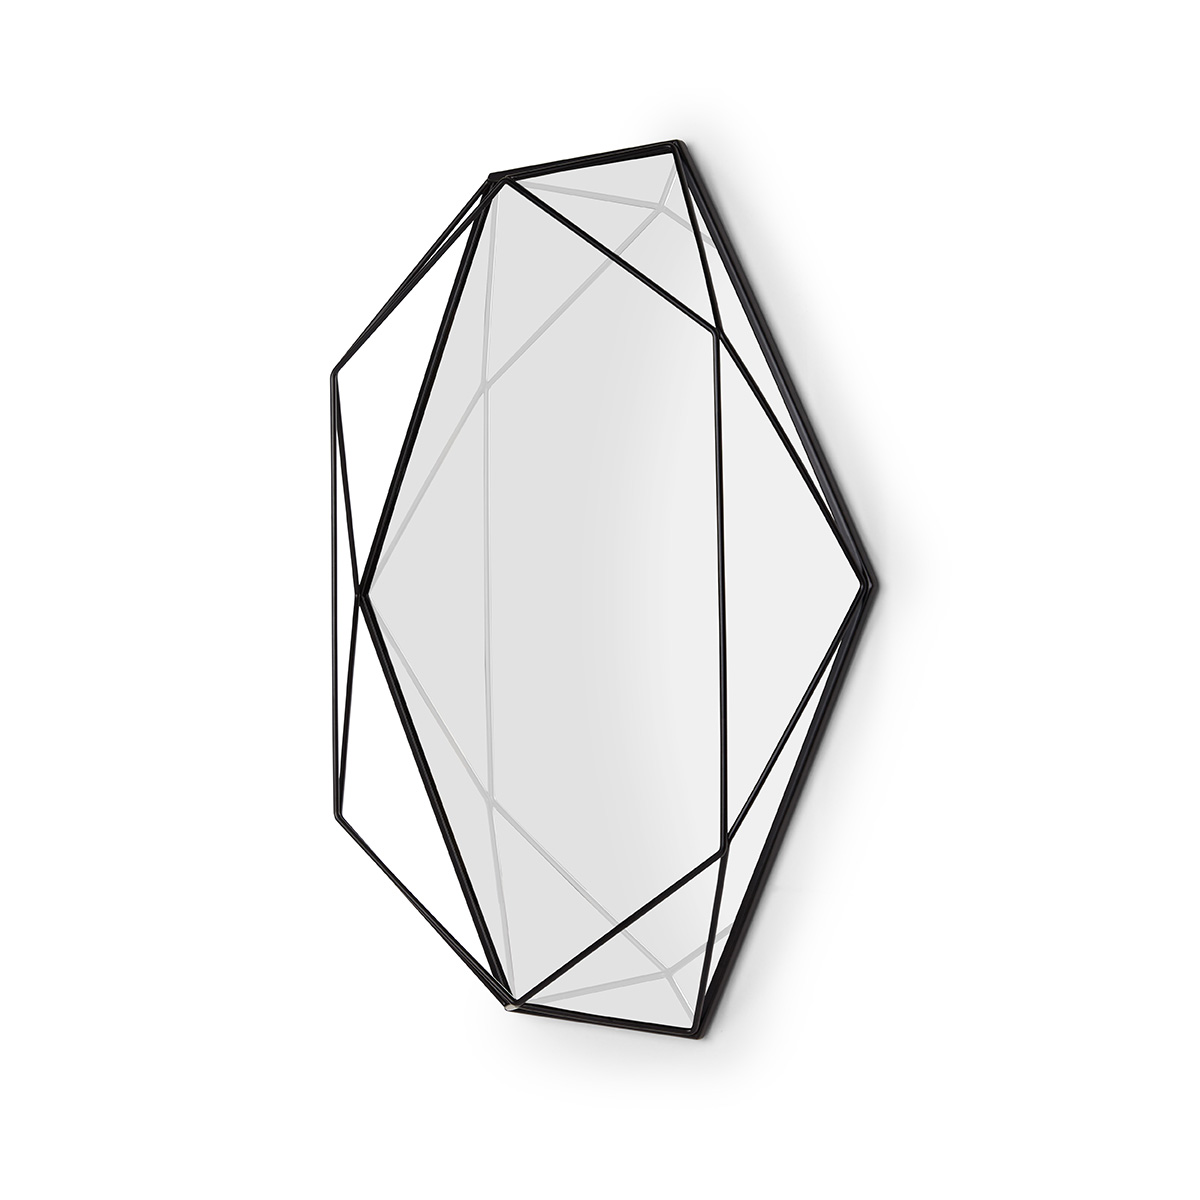 Ogledalo Prisma crno - 358776-040